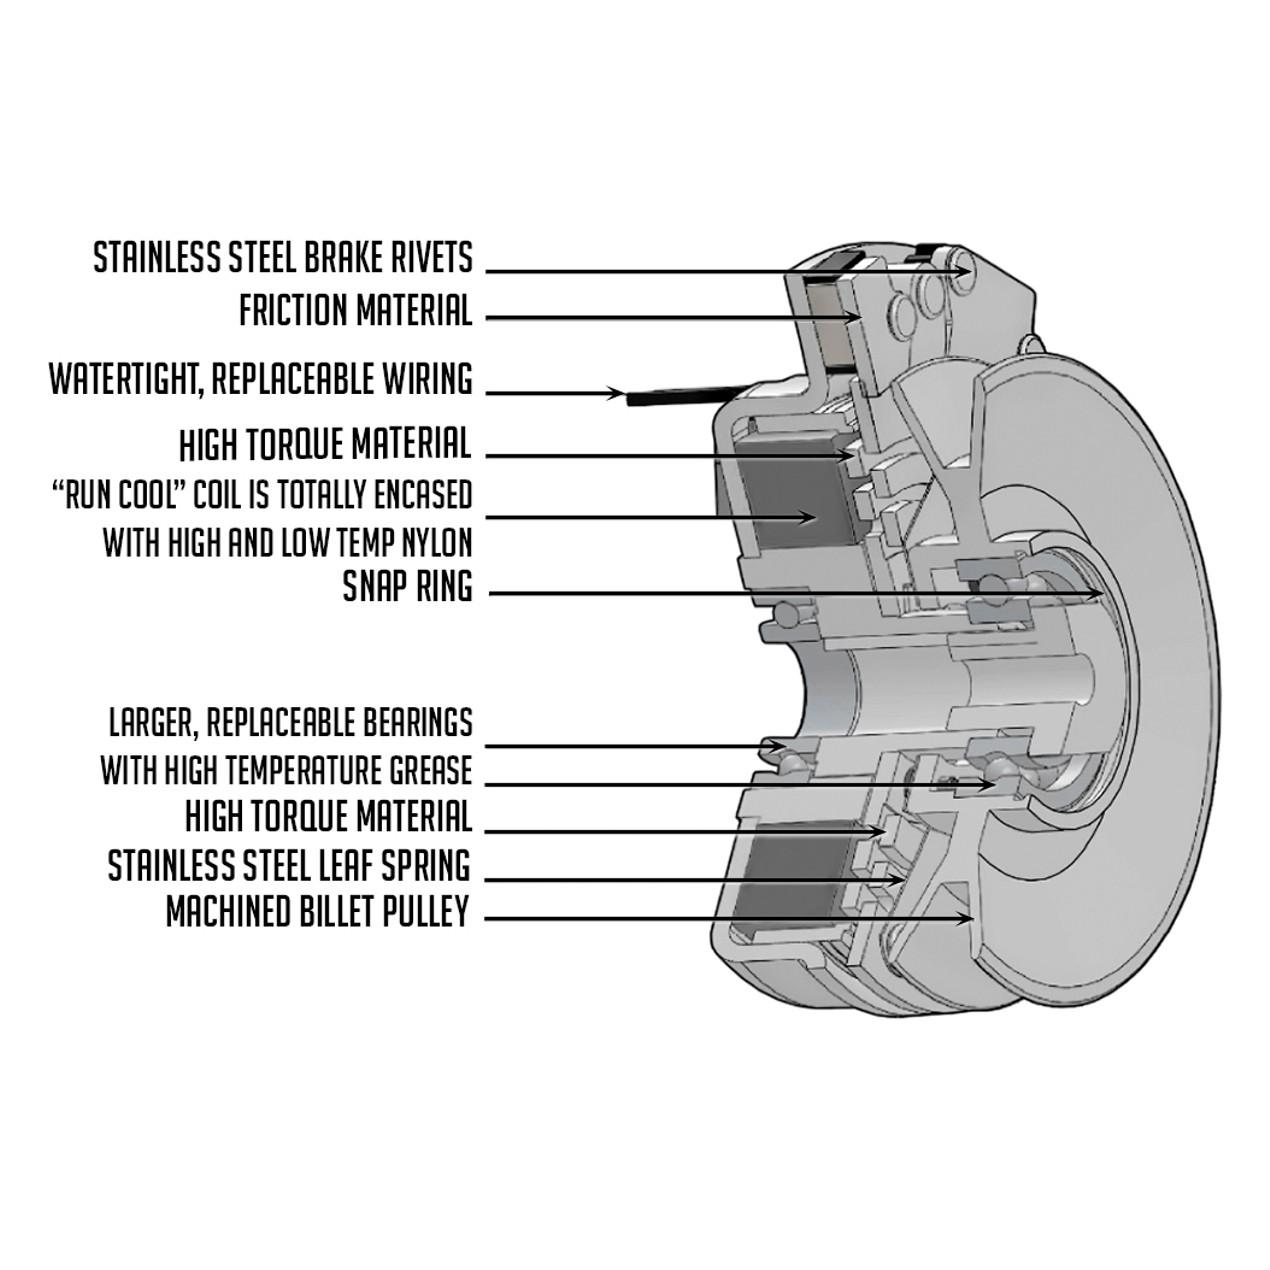 New Pto Clutch Fits Snapper Pro S150xt S200xt S50xt S75xt Sw30 Wiring Diagram Series